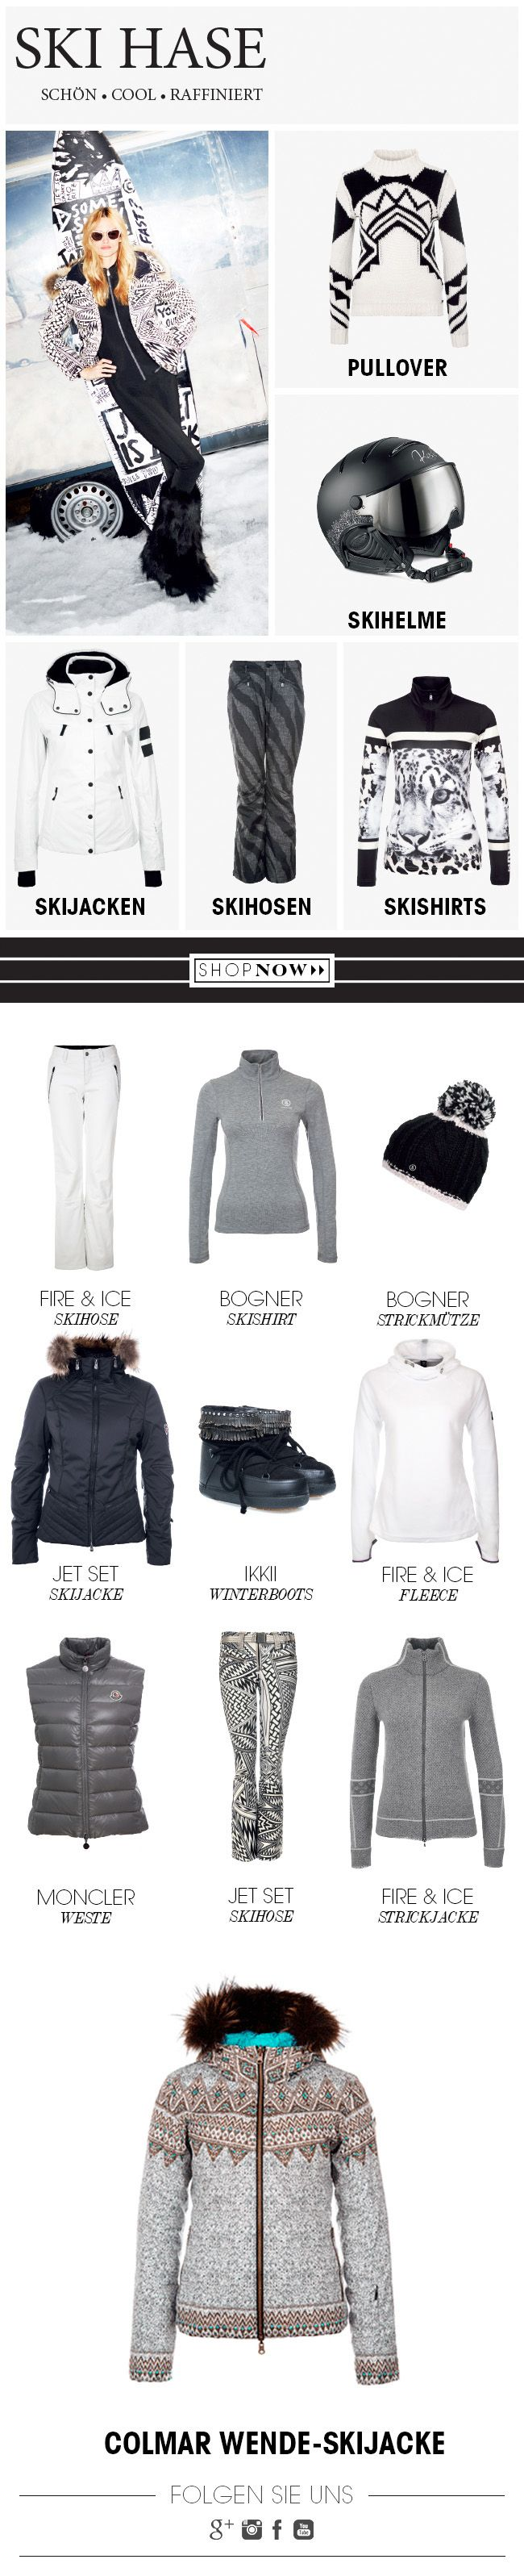 #sailerstyle #sailerfashionview #fashion #skifashion #ski #winter2015 #wintersport #jetset #colmar #skijacke #skimode #skibekleidung #skiwear